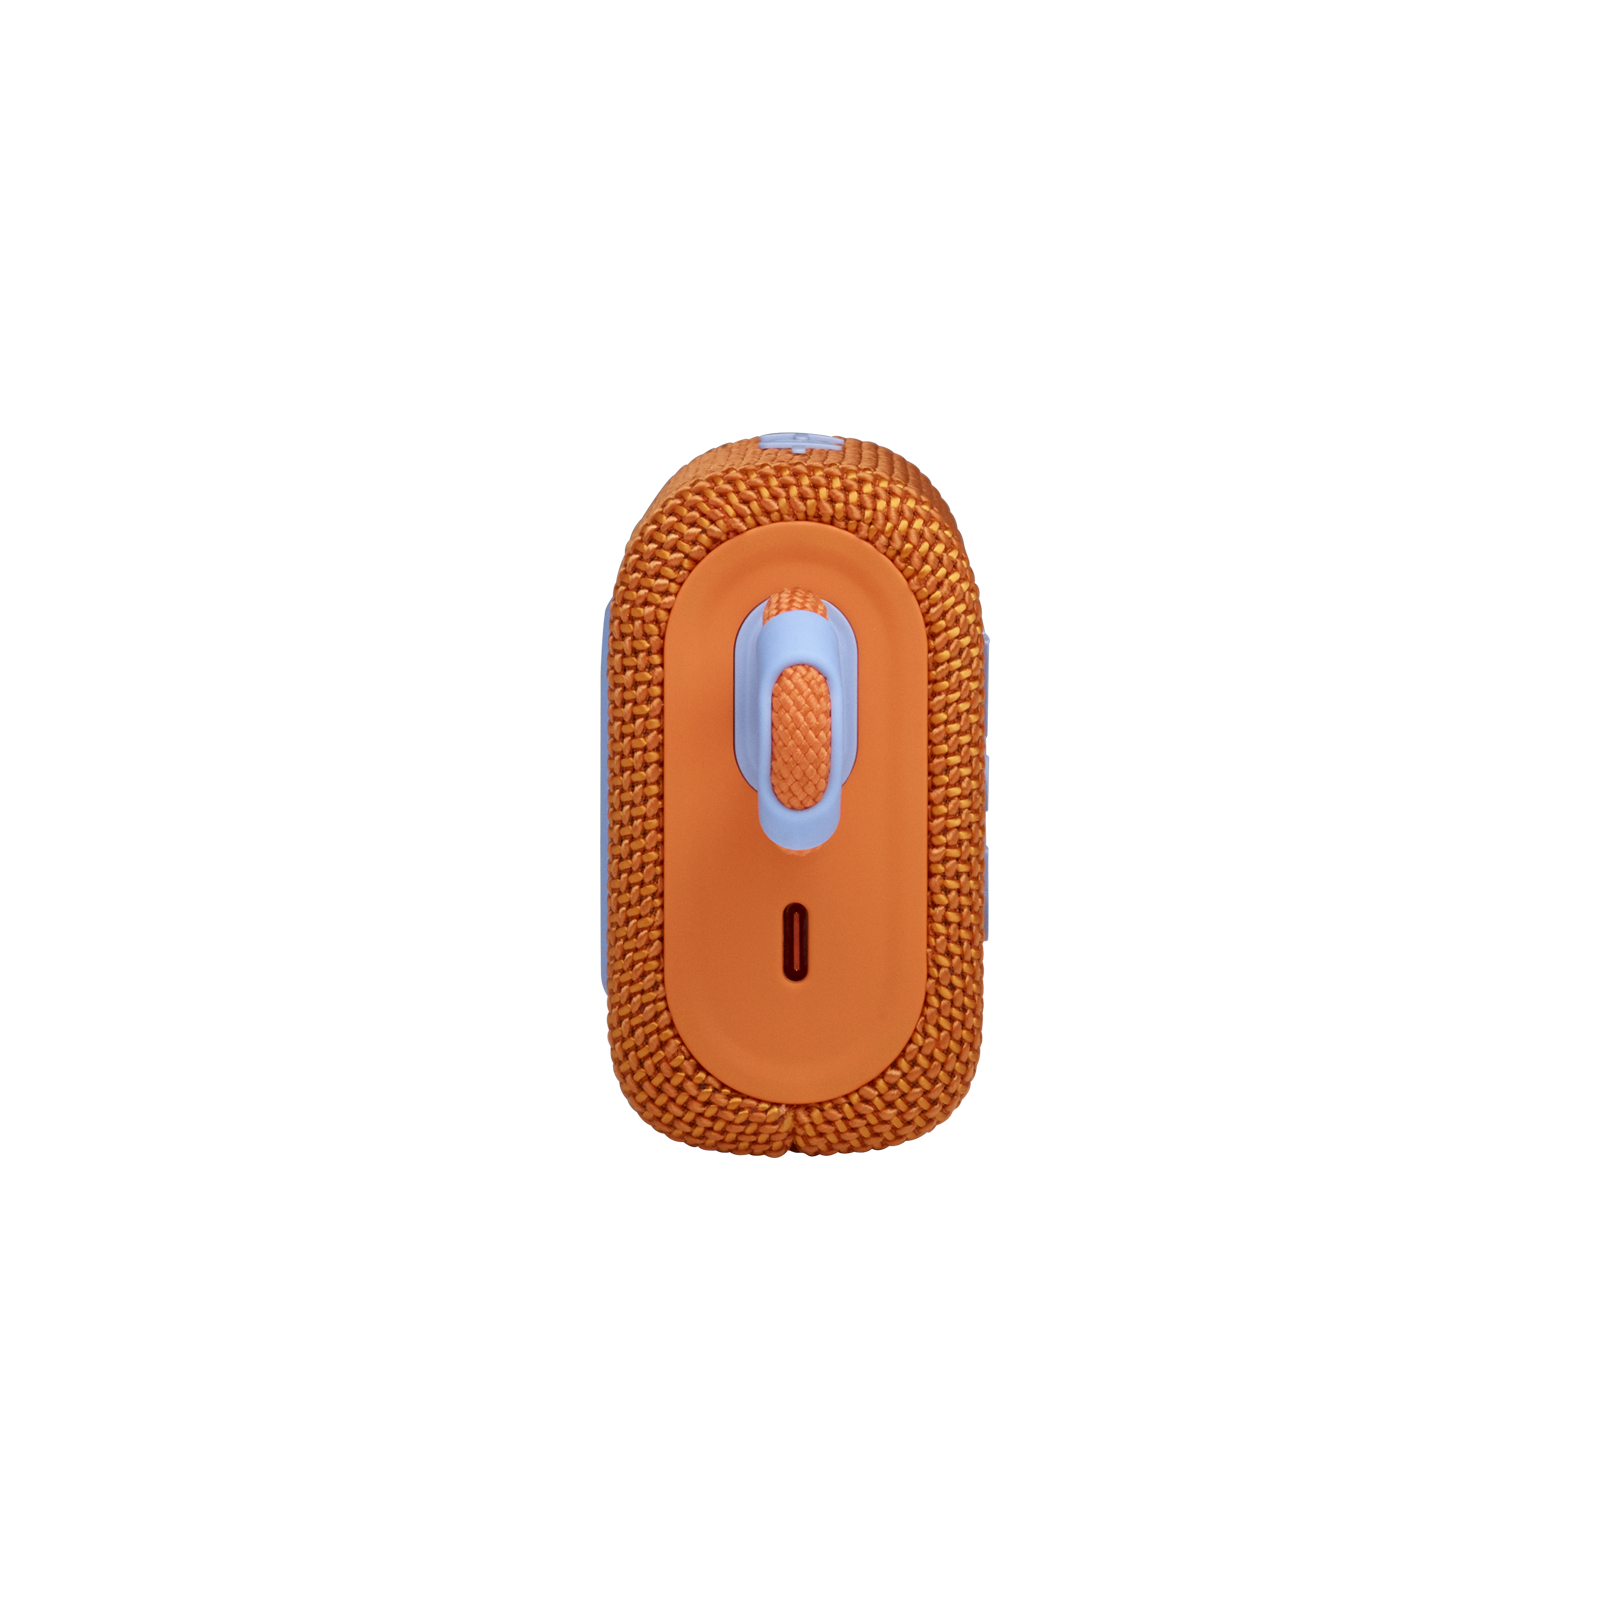 JBL GO 3 - Orange - Portable Waterproof Speaker - Left